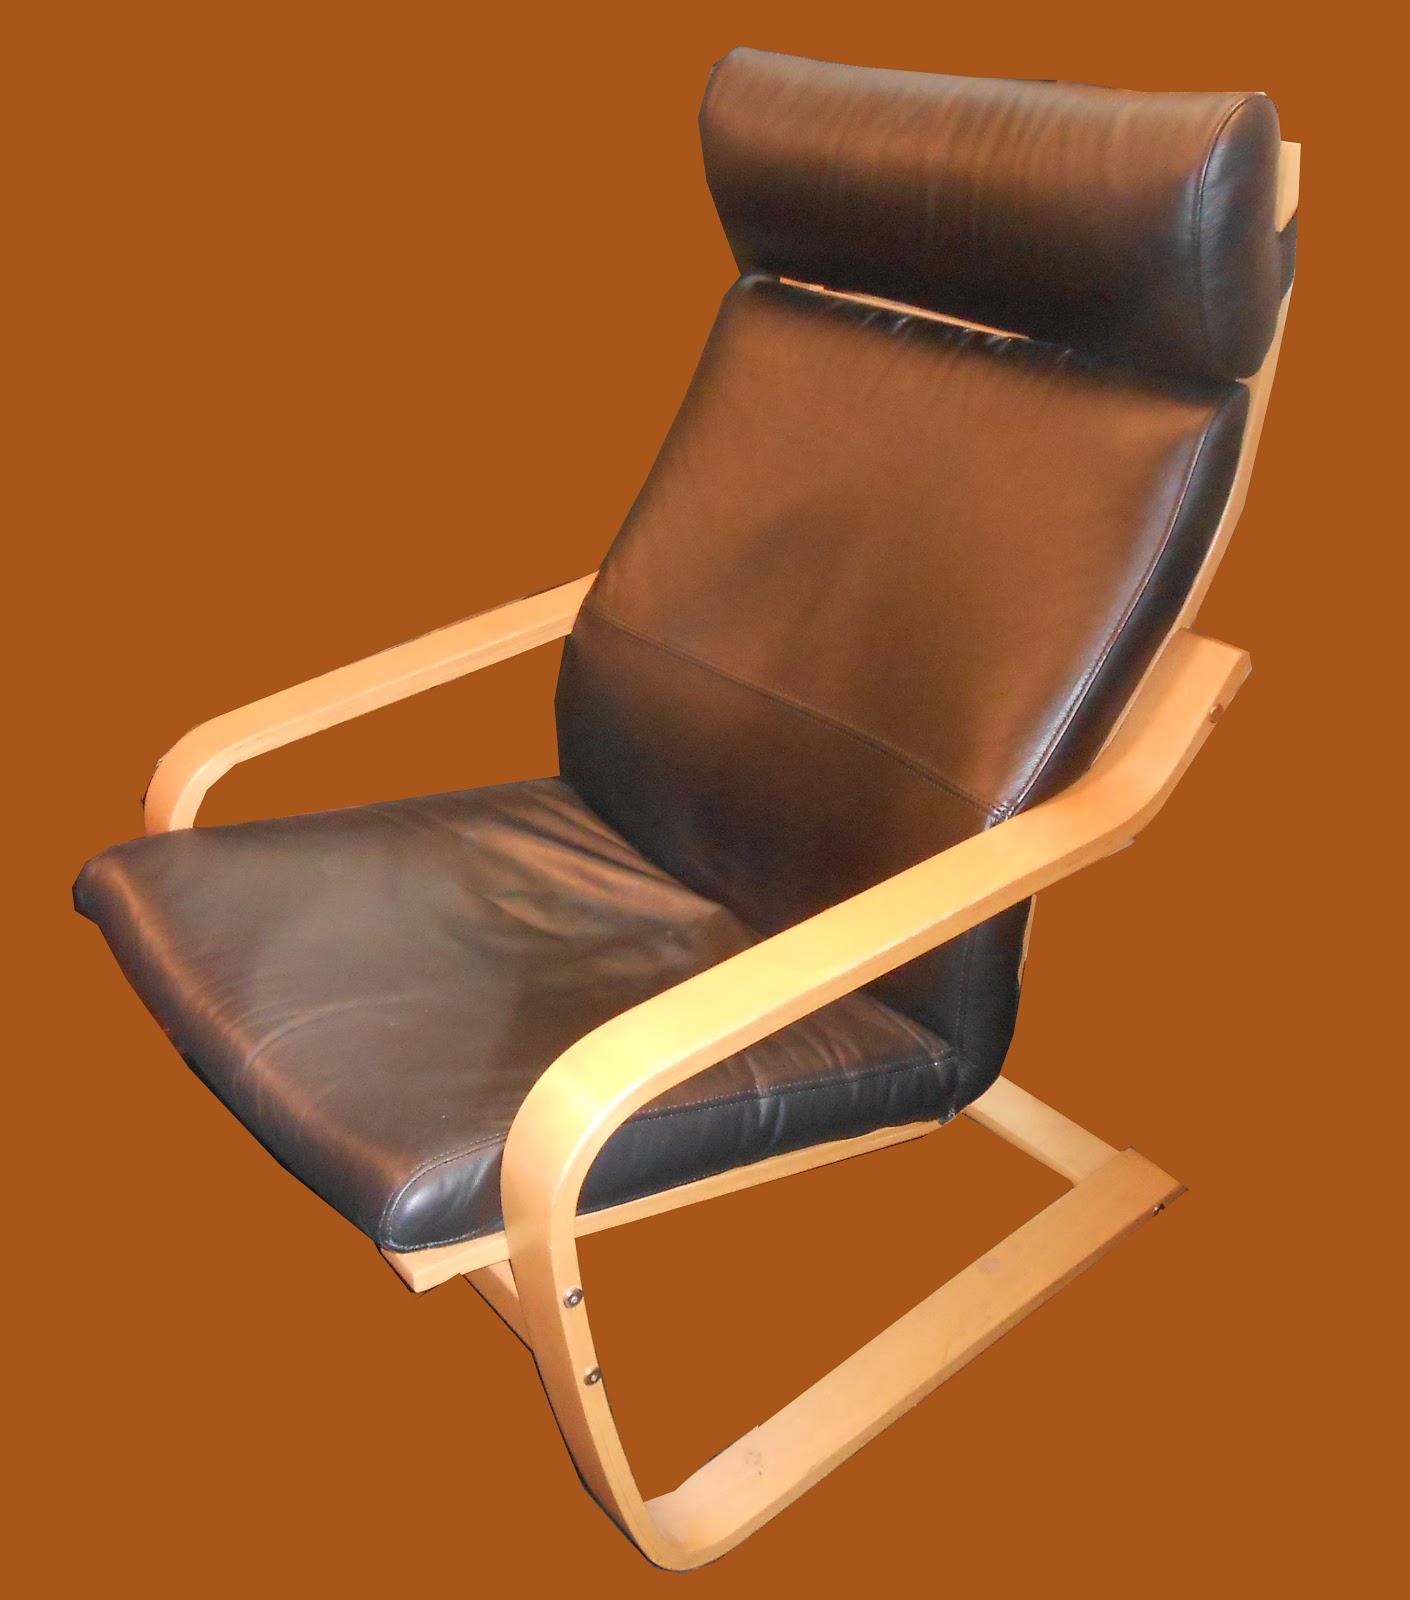 Uhuru Furniture Collectibles Ikea Poang Lounge Chair In